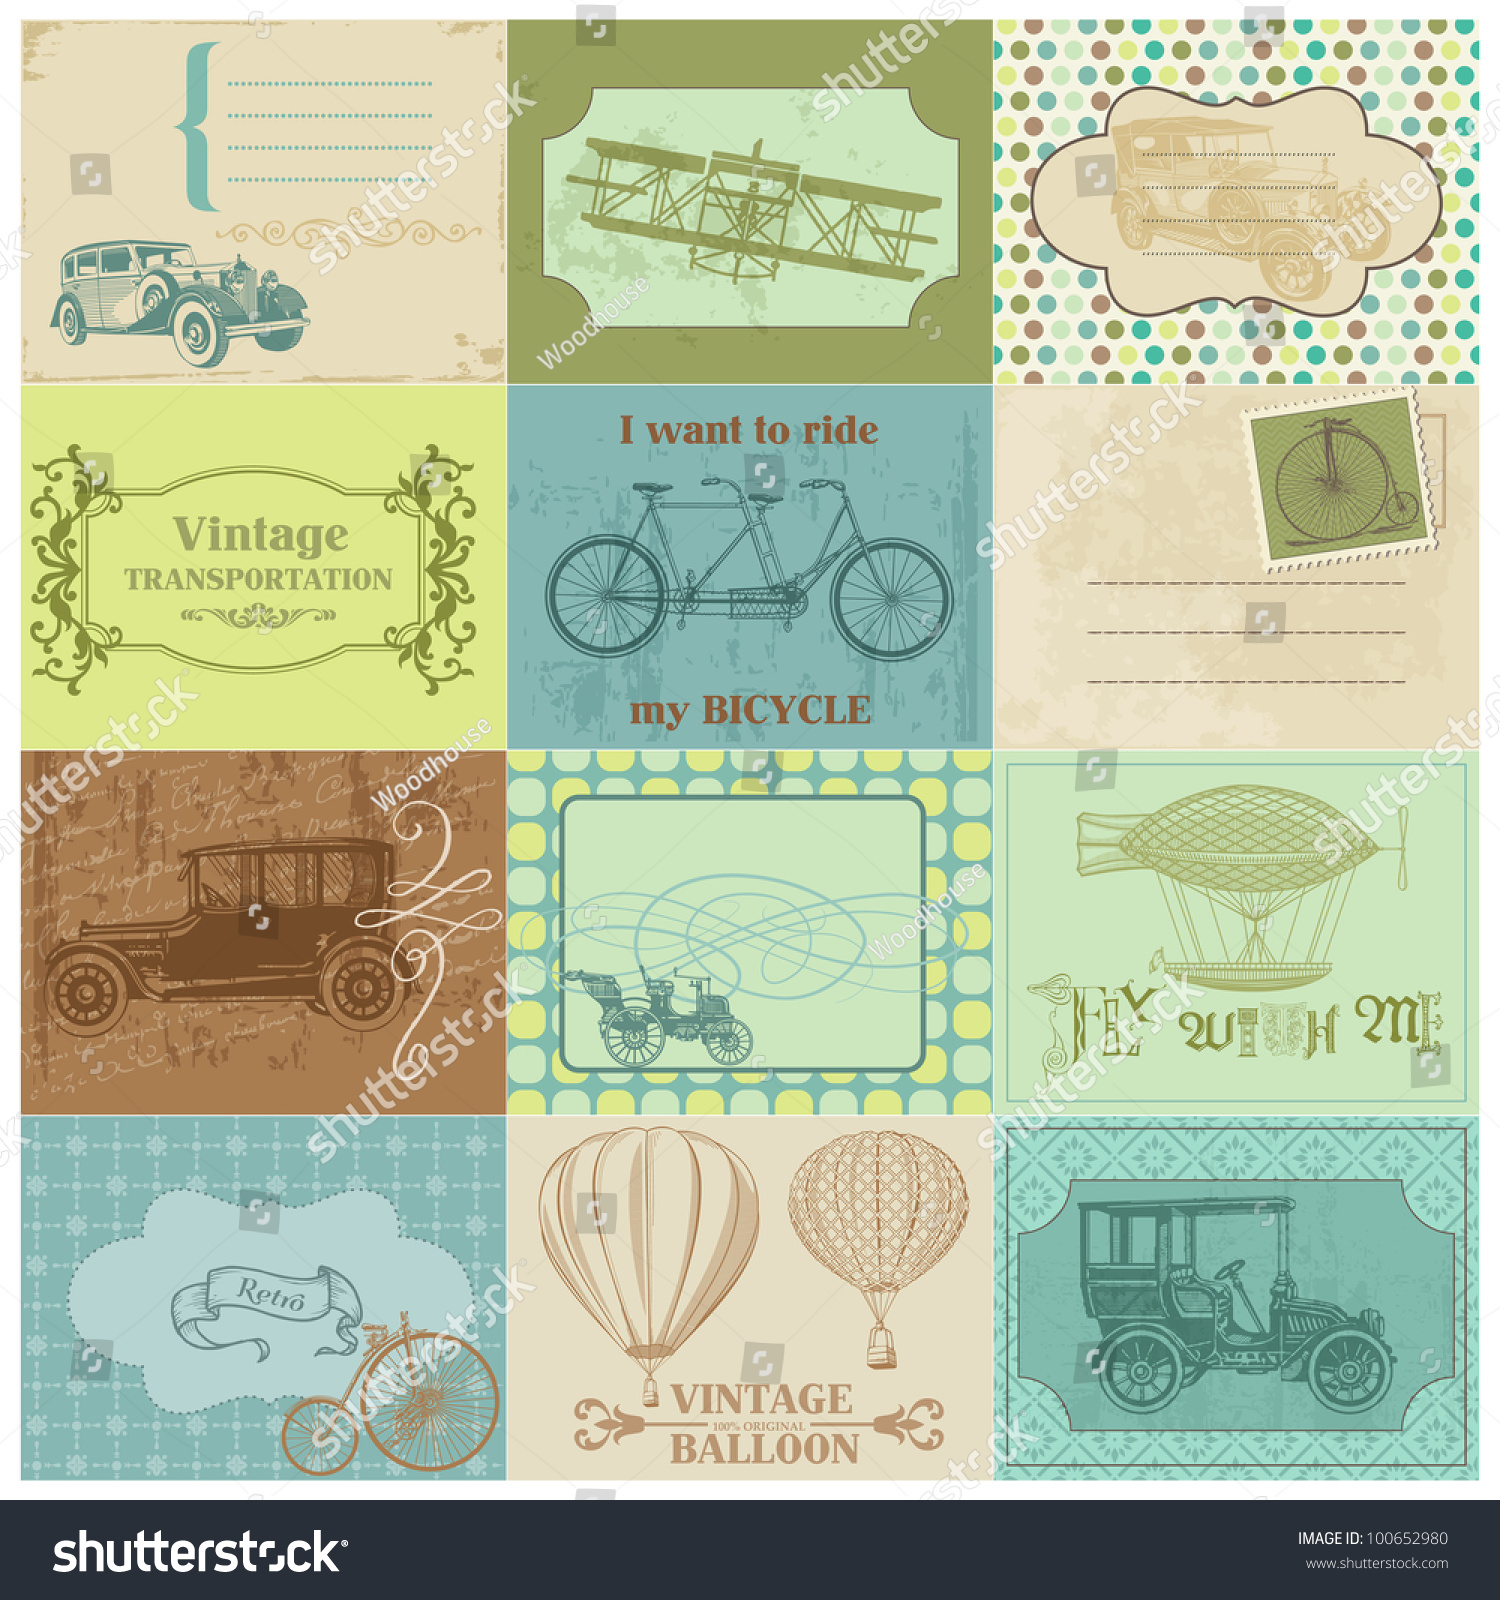 Scrapbook paper designs - Scrapbook Paper Tags And Design Elements Vintage Transportation In Vector